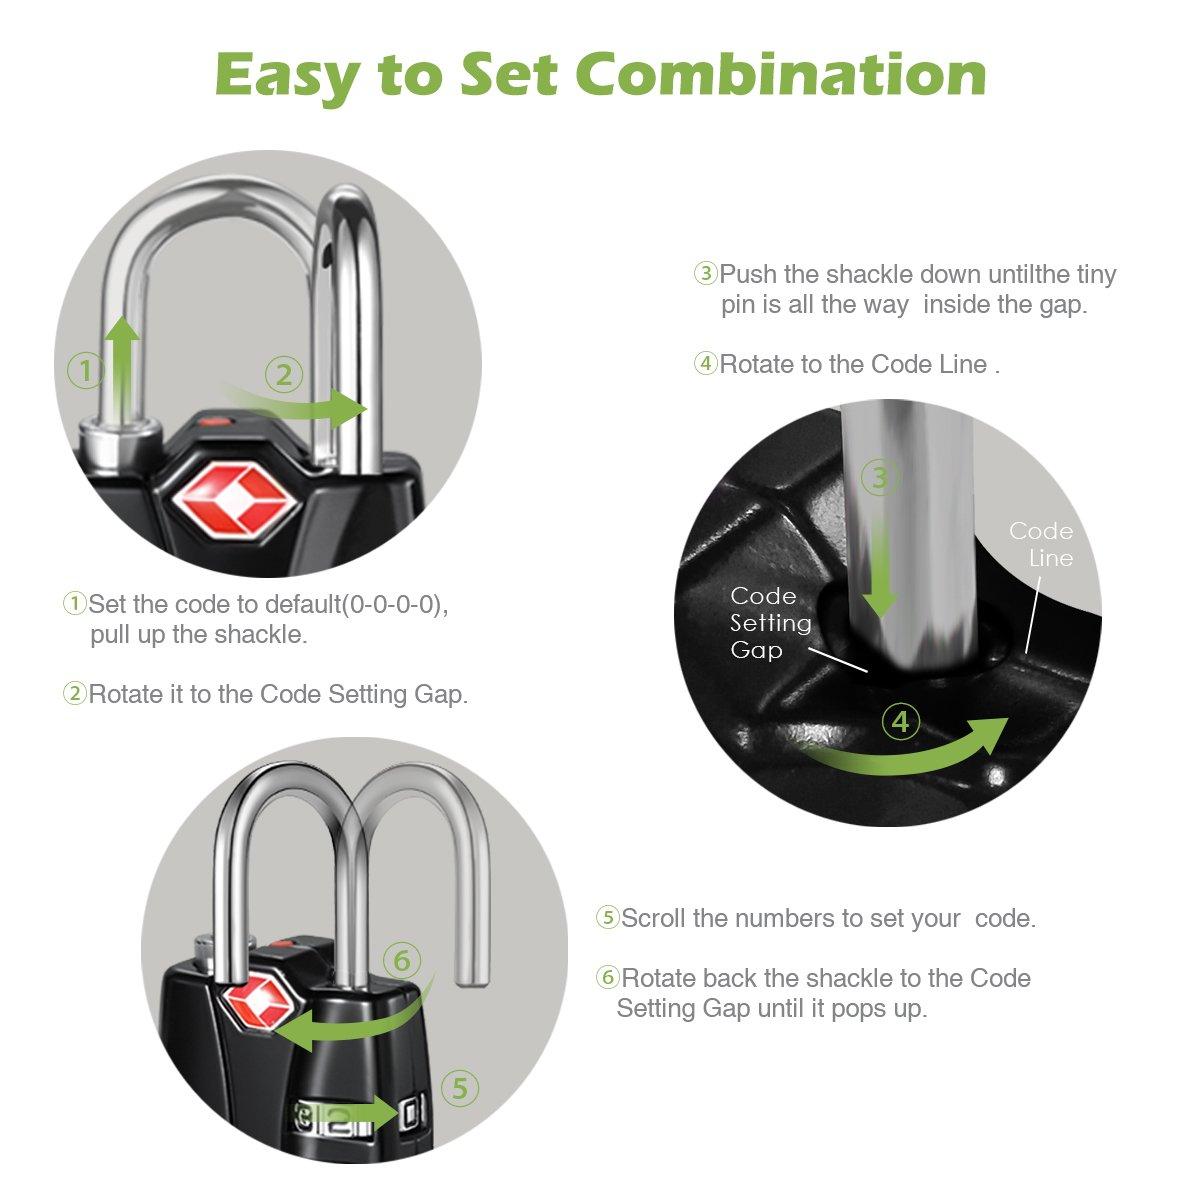 KeeKit Combination Locks, TSA Approved Luggage Locks with Open Alert Indicator, TSA Luggage Locks for Travel, Suitcase, Baggage & Backpack, Gym Locker (Black, 2 Pack) by KeeKit (Image #4)